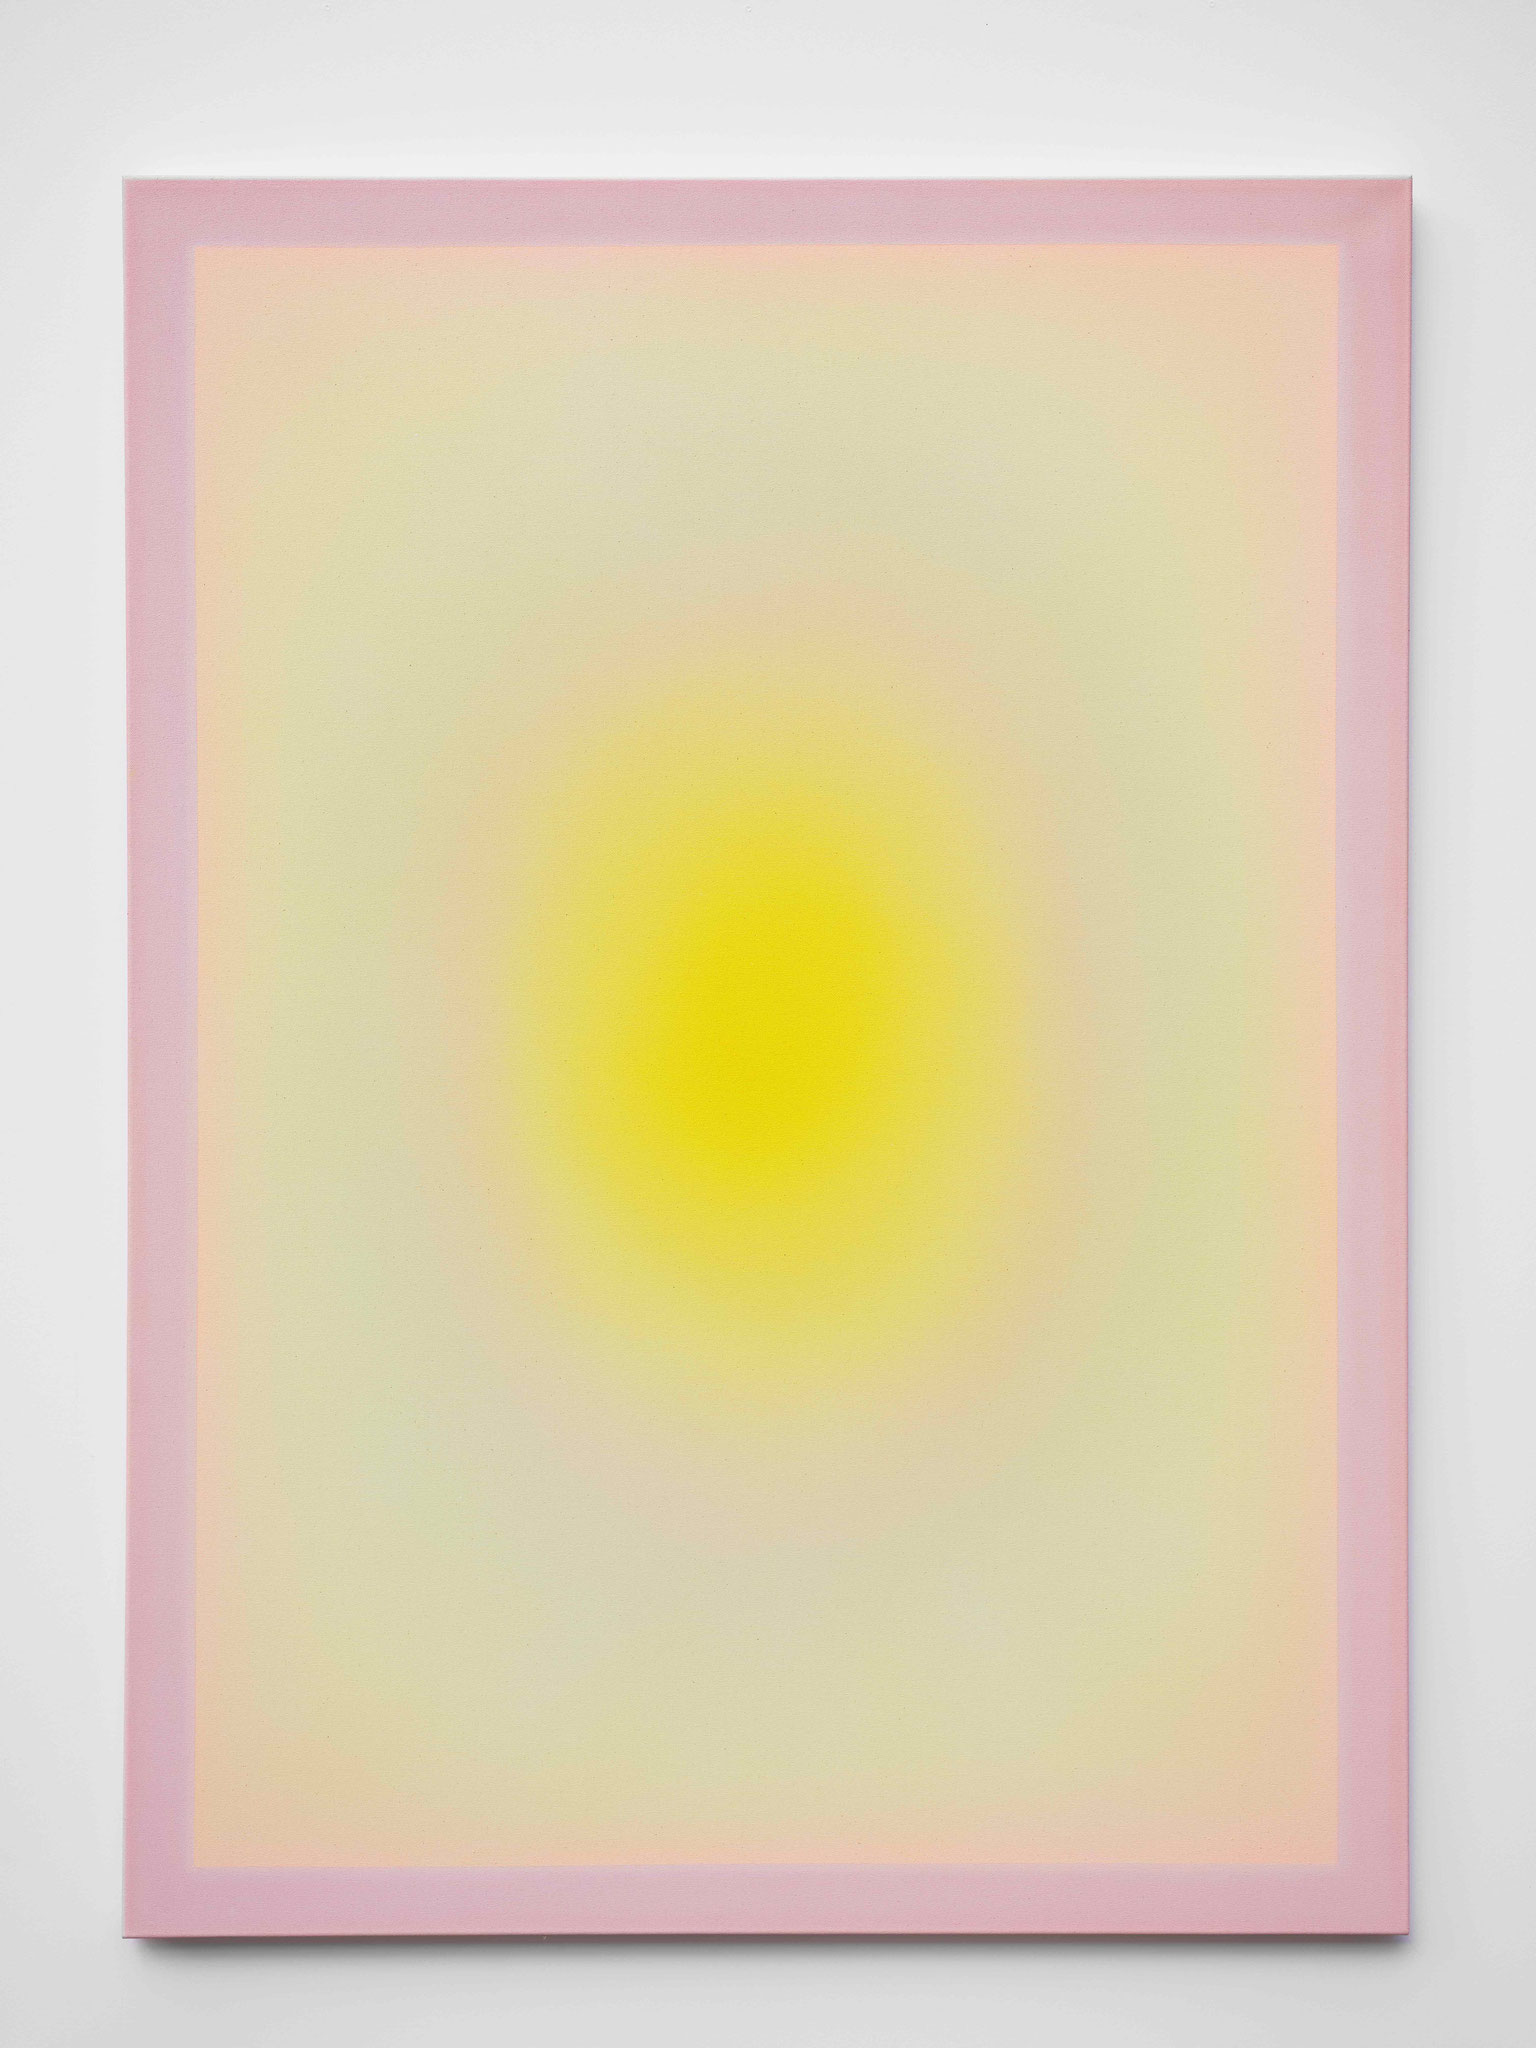 "Alina Birkner ""Untitled (Citrinitas)"" 2019, 180x130 cm, Acrylic on Canvas"